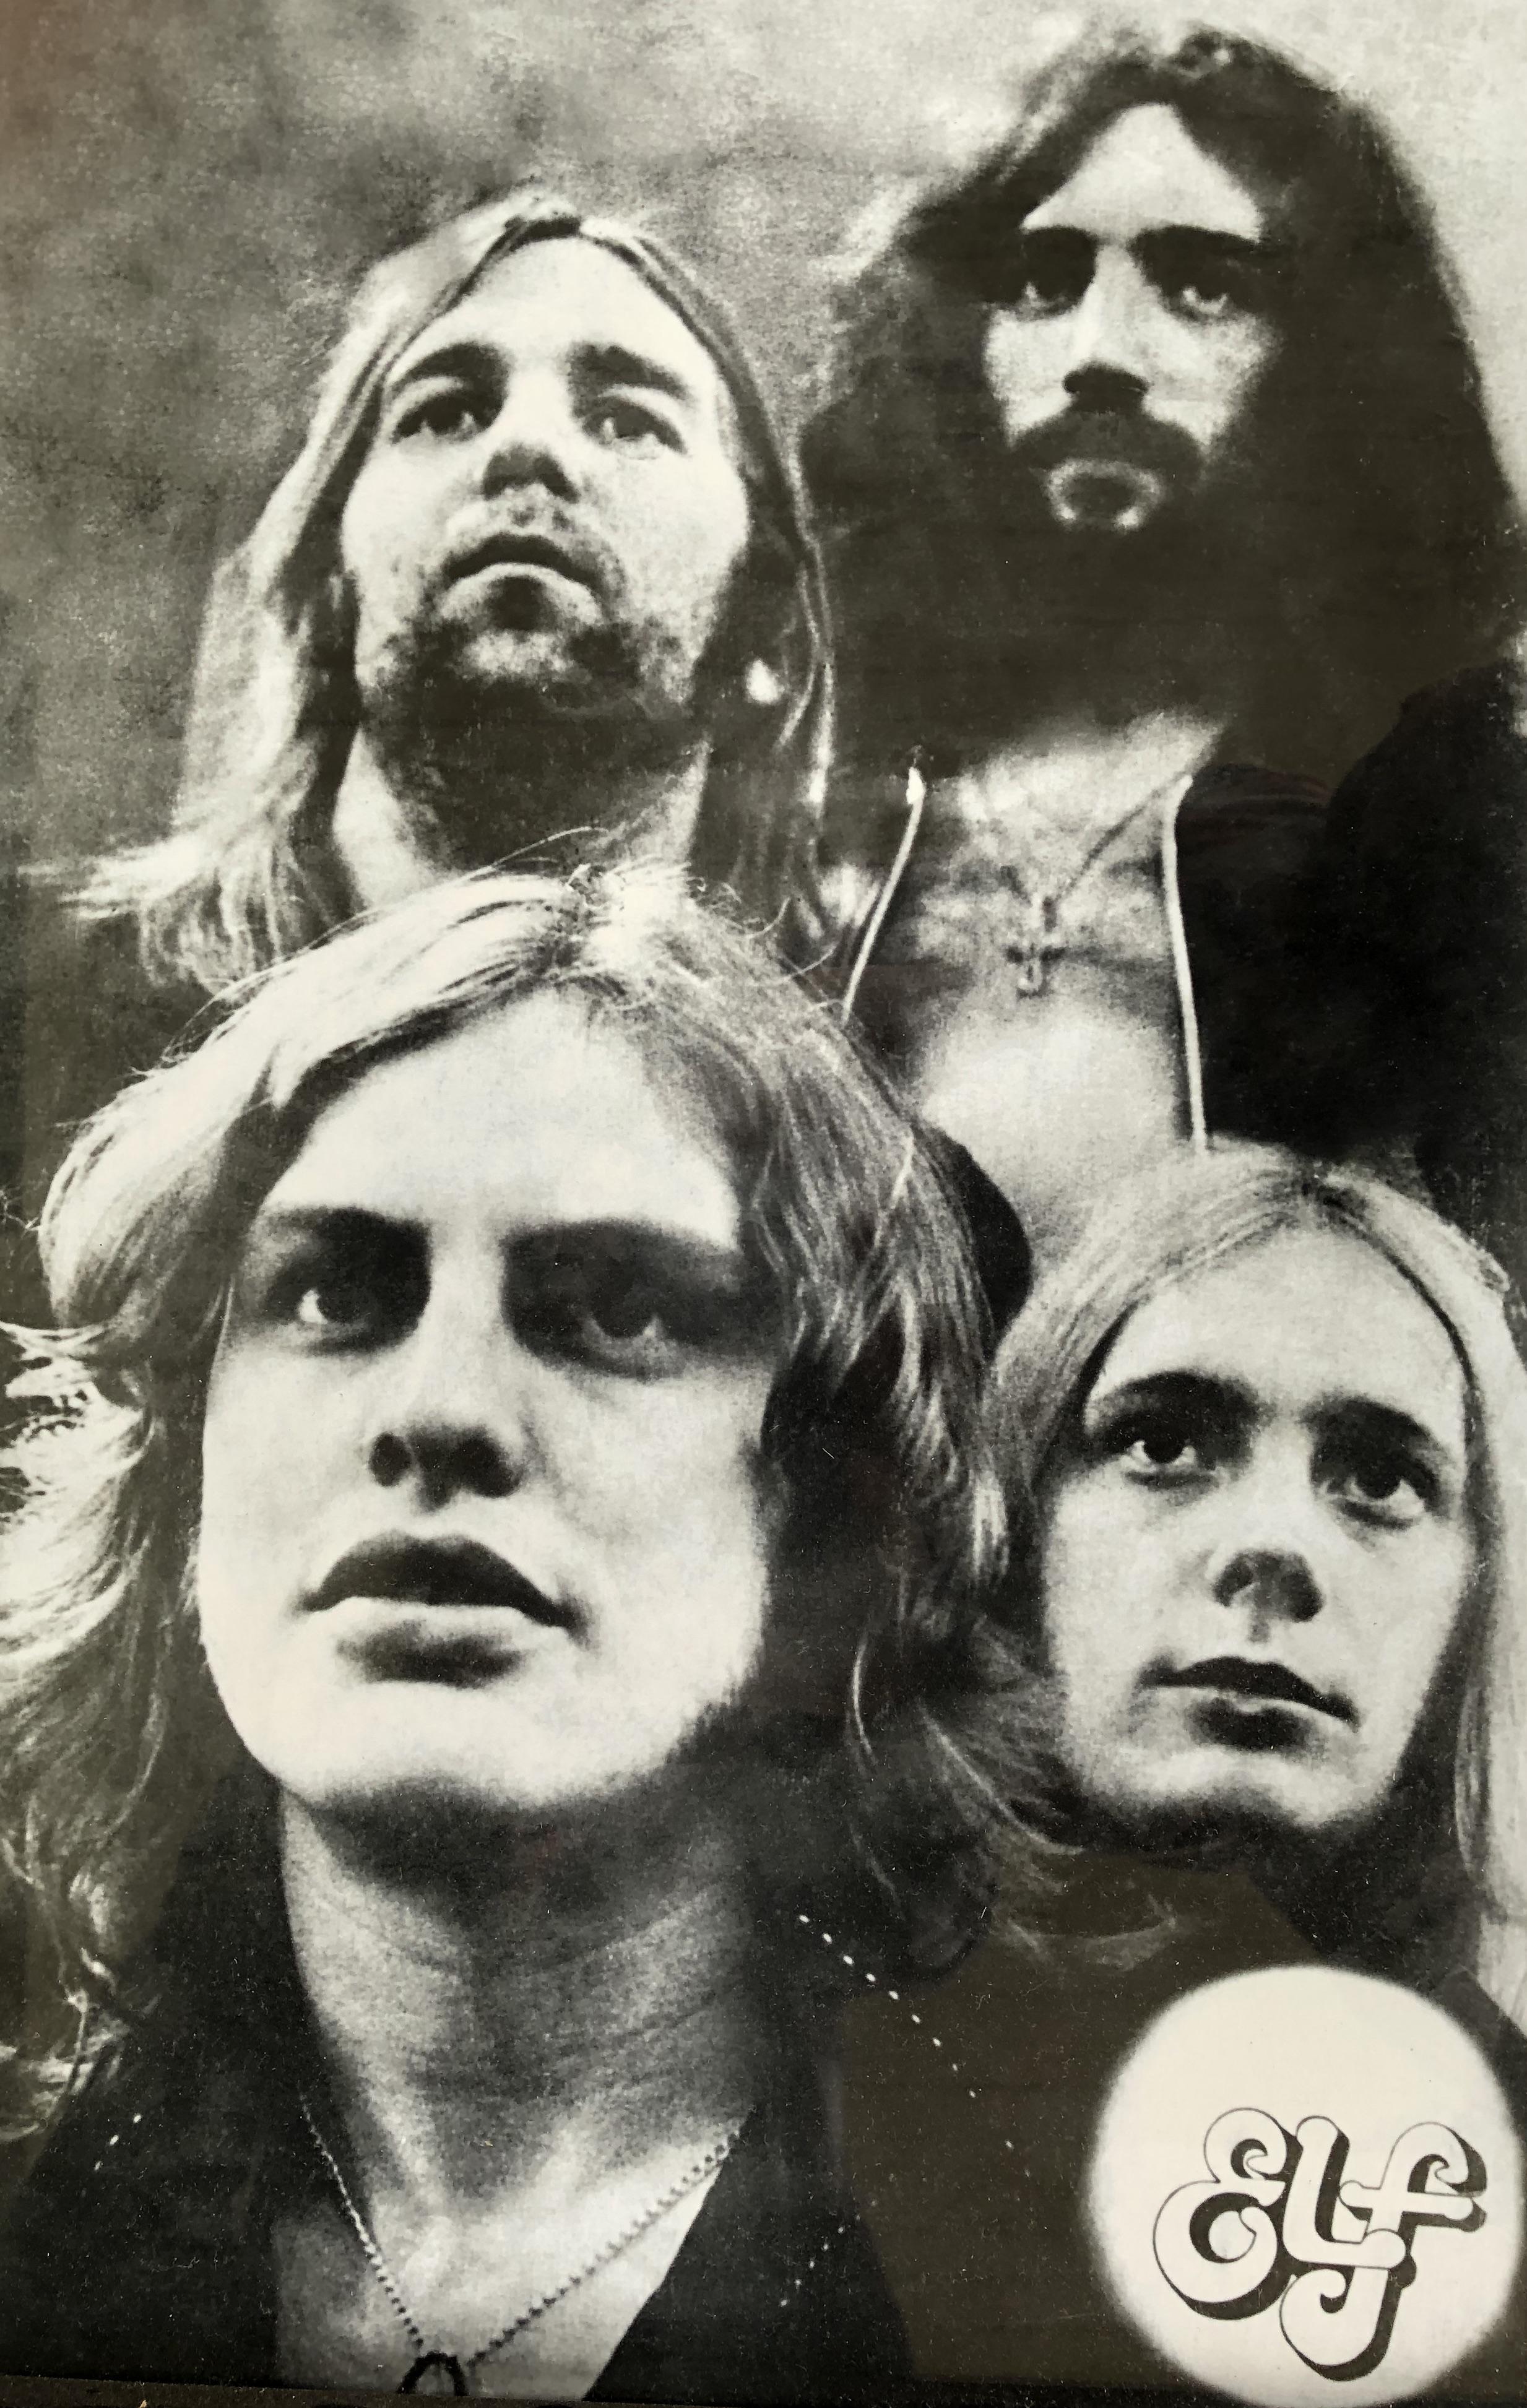 In 1976 -